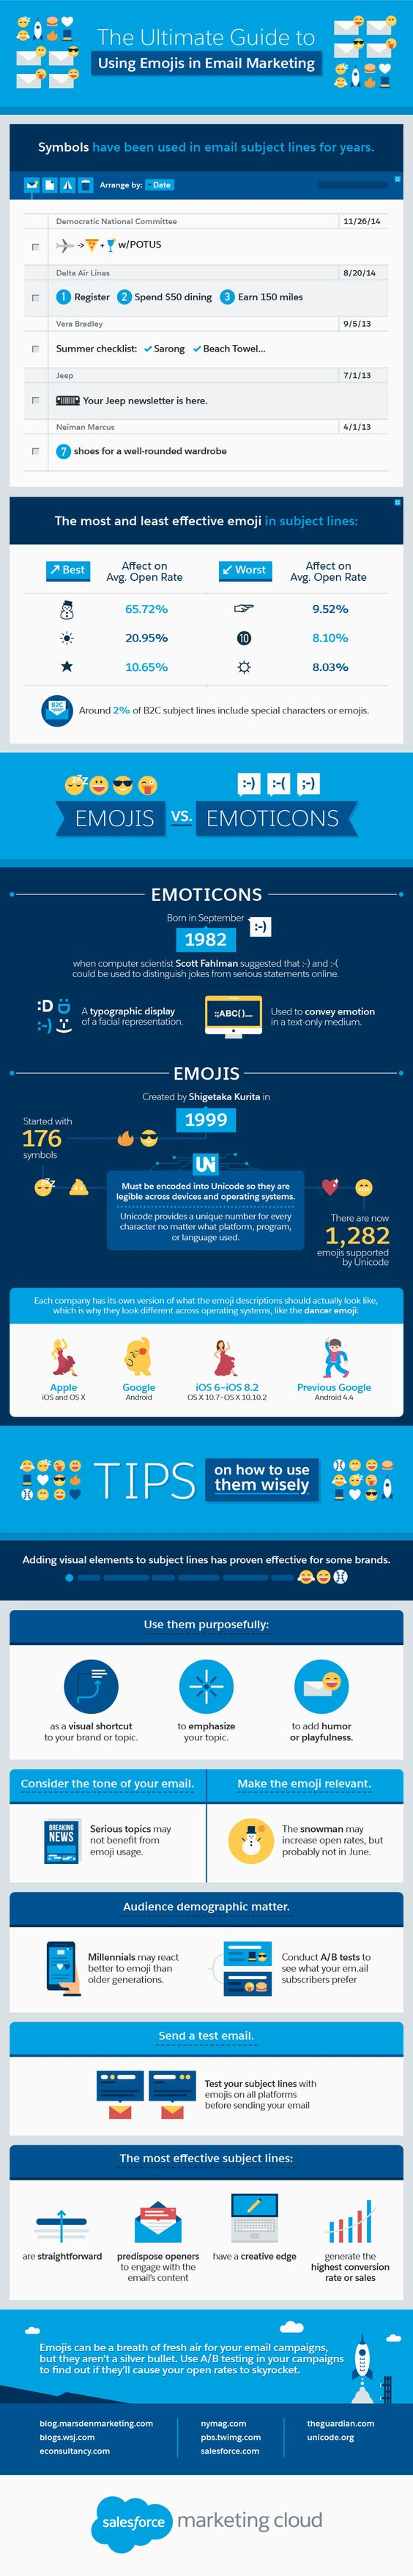 Emojis in Email Marketing